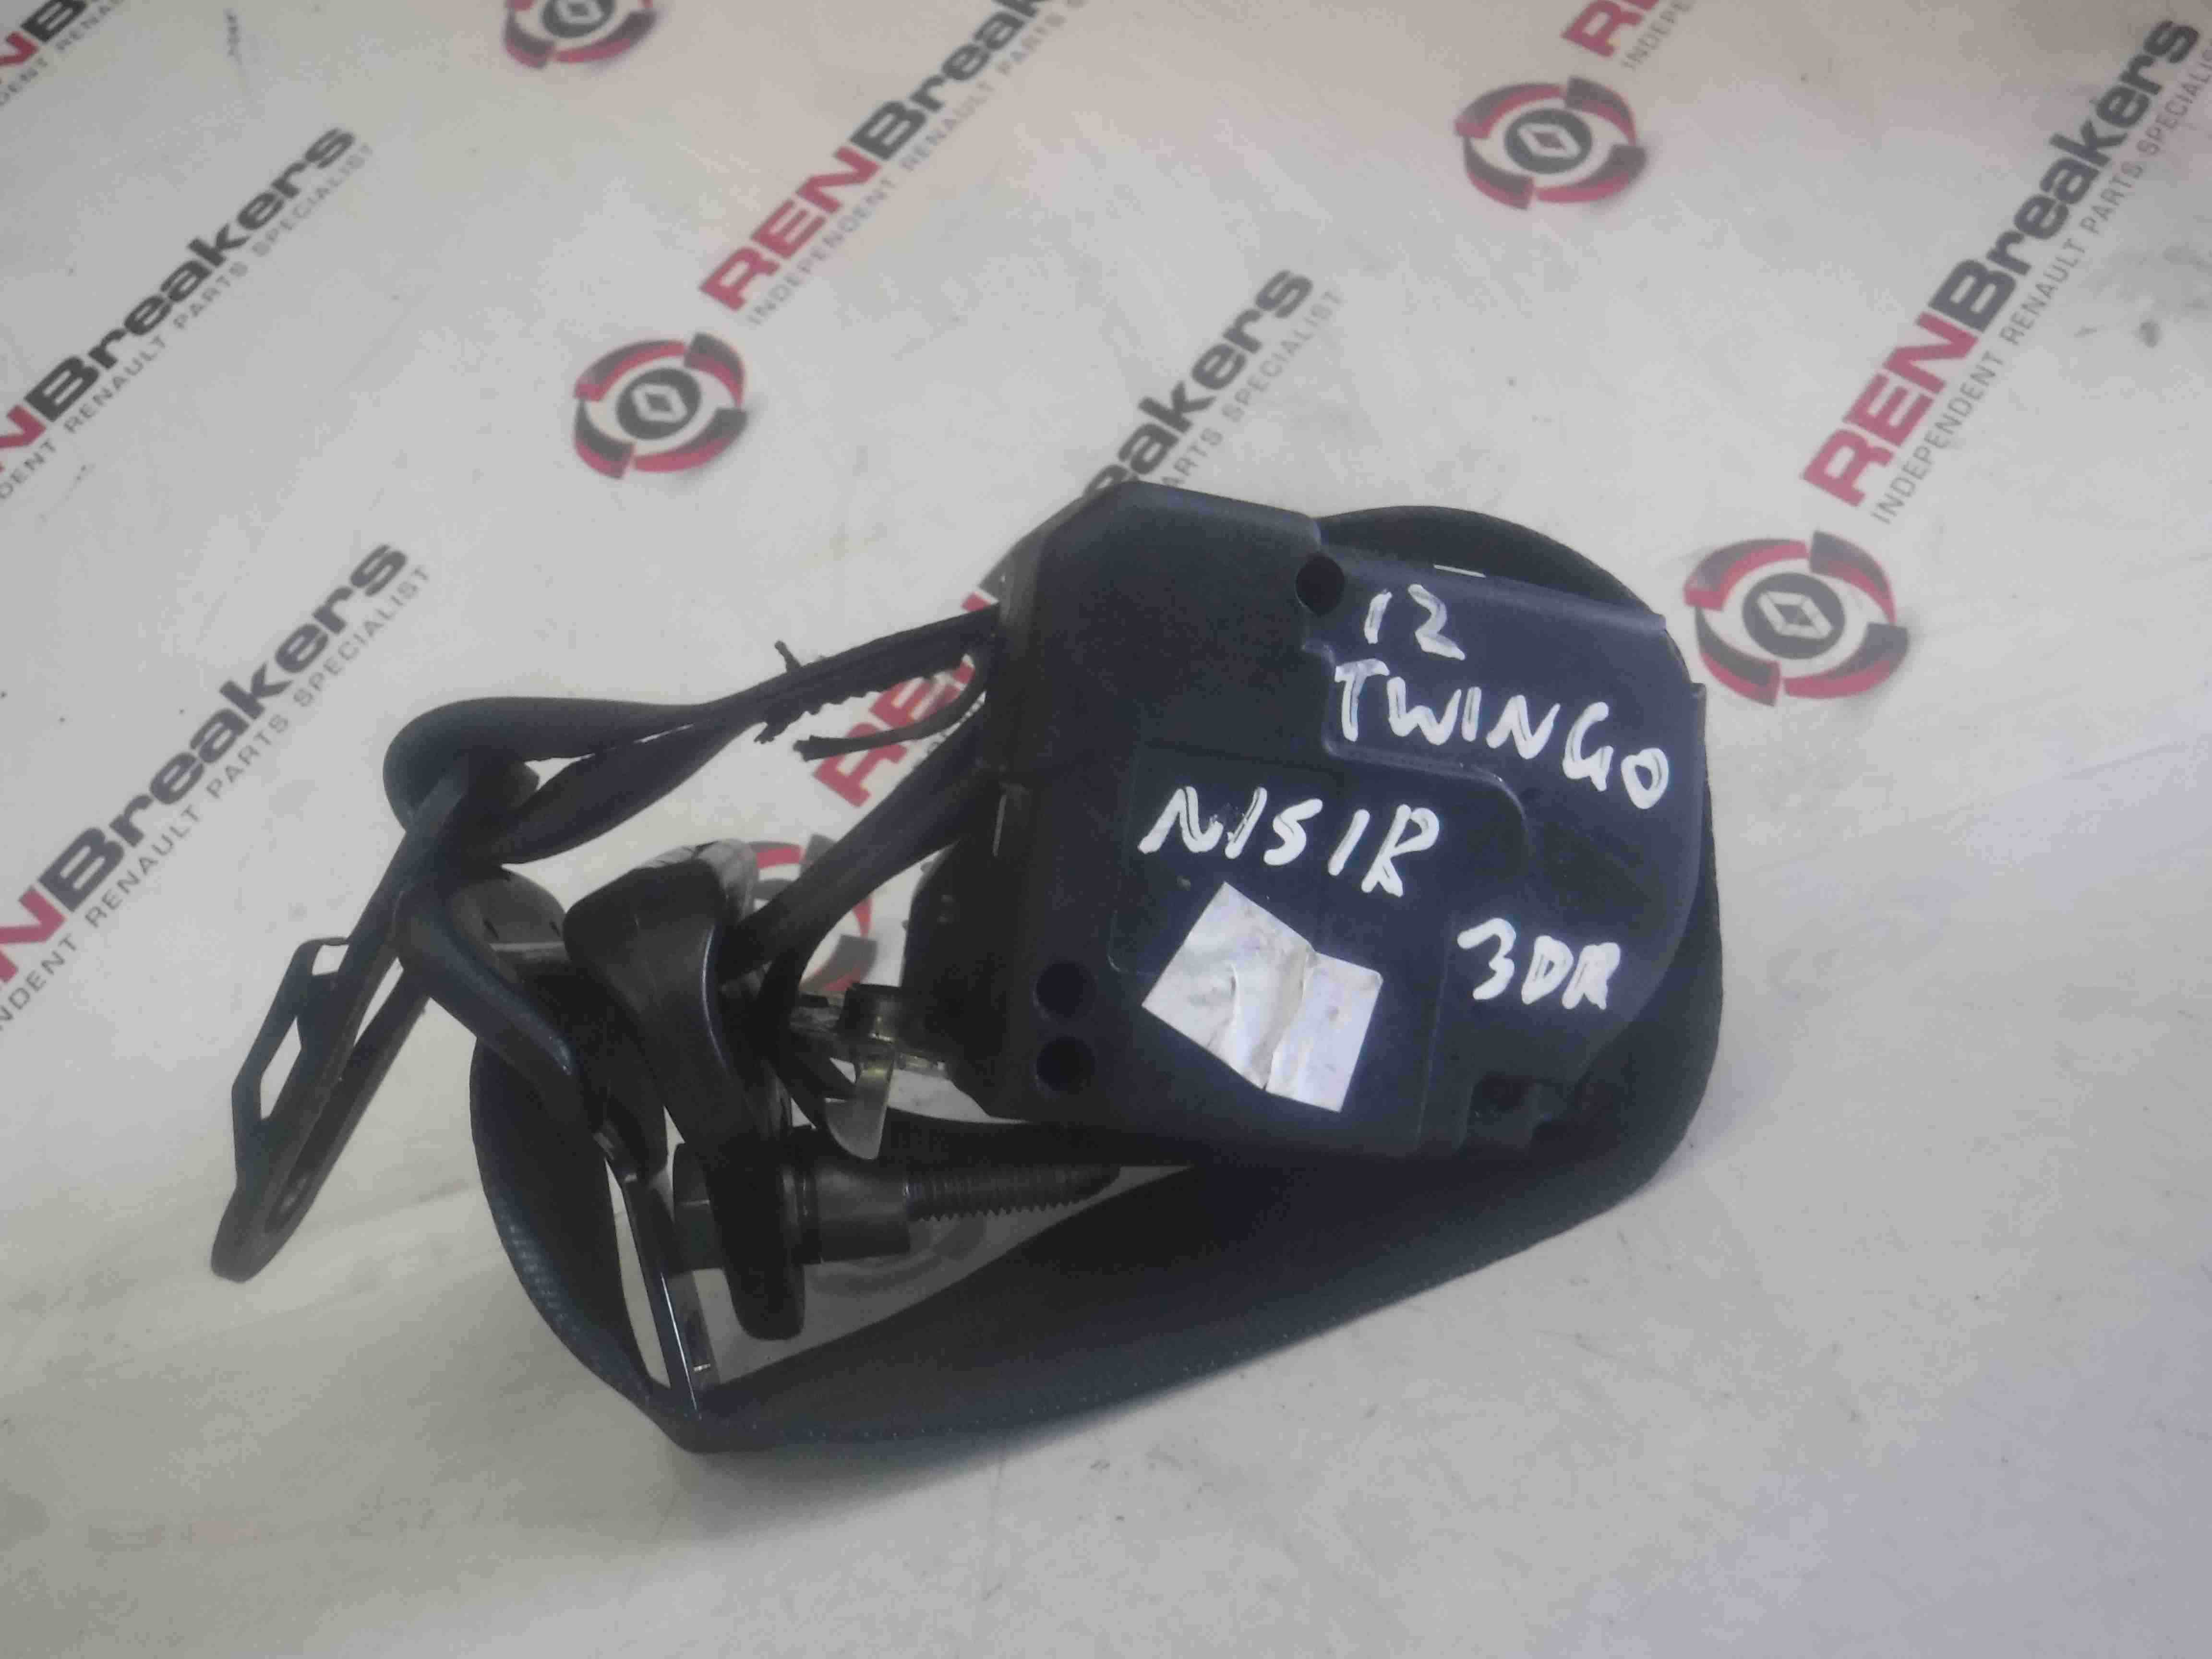 Renault Twingo 2011-2014 Passenger NSR Rear Seat Belt 3dr